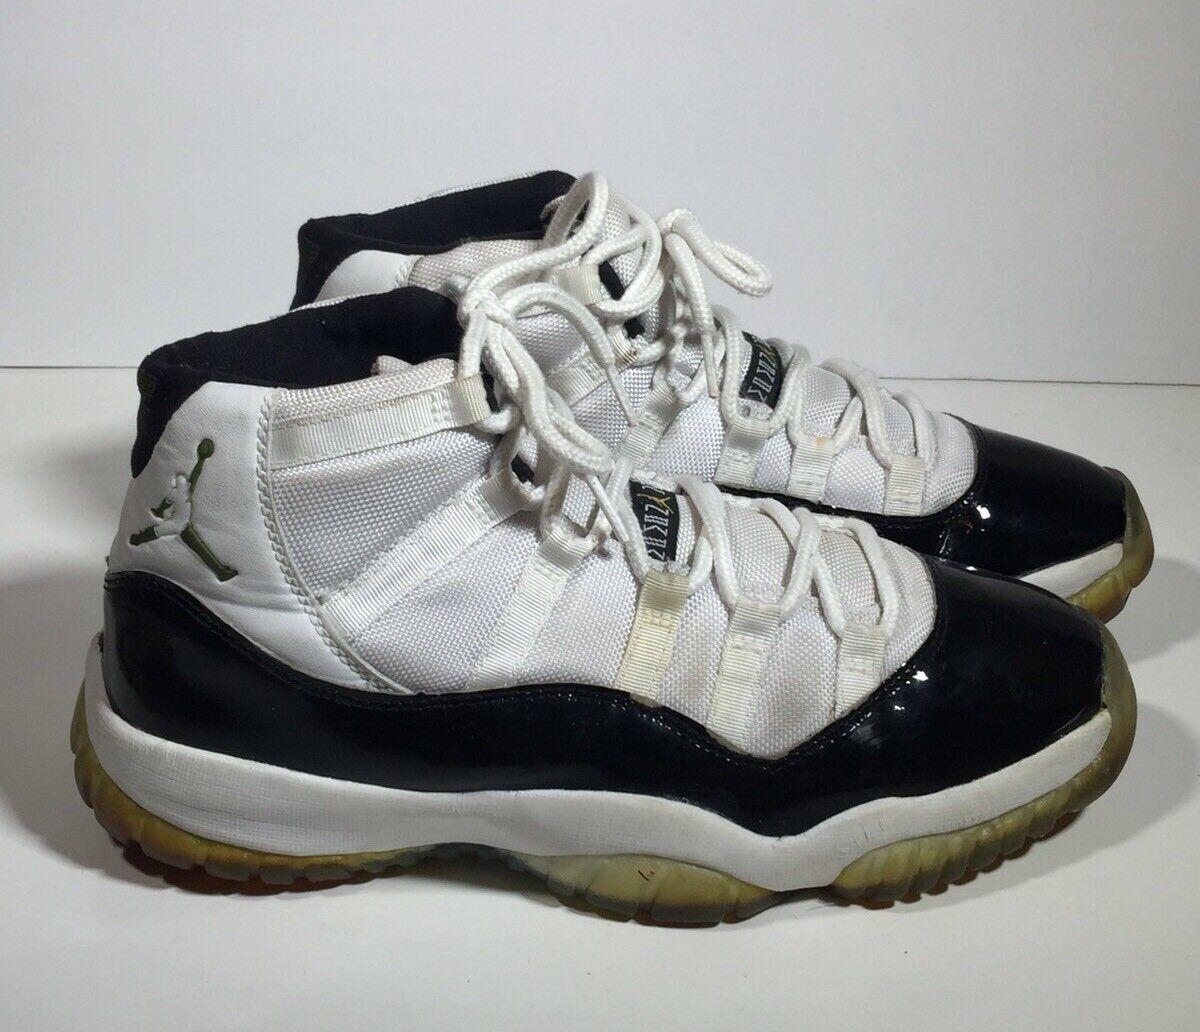 2006 Nike Air Jordan XI Retro DMP gold Concord Authentic 136046-171 Mens Sz 9.5